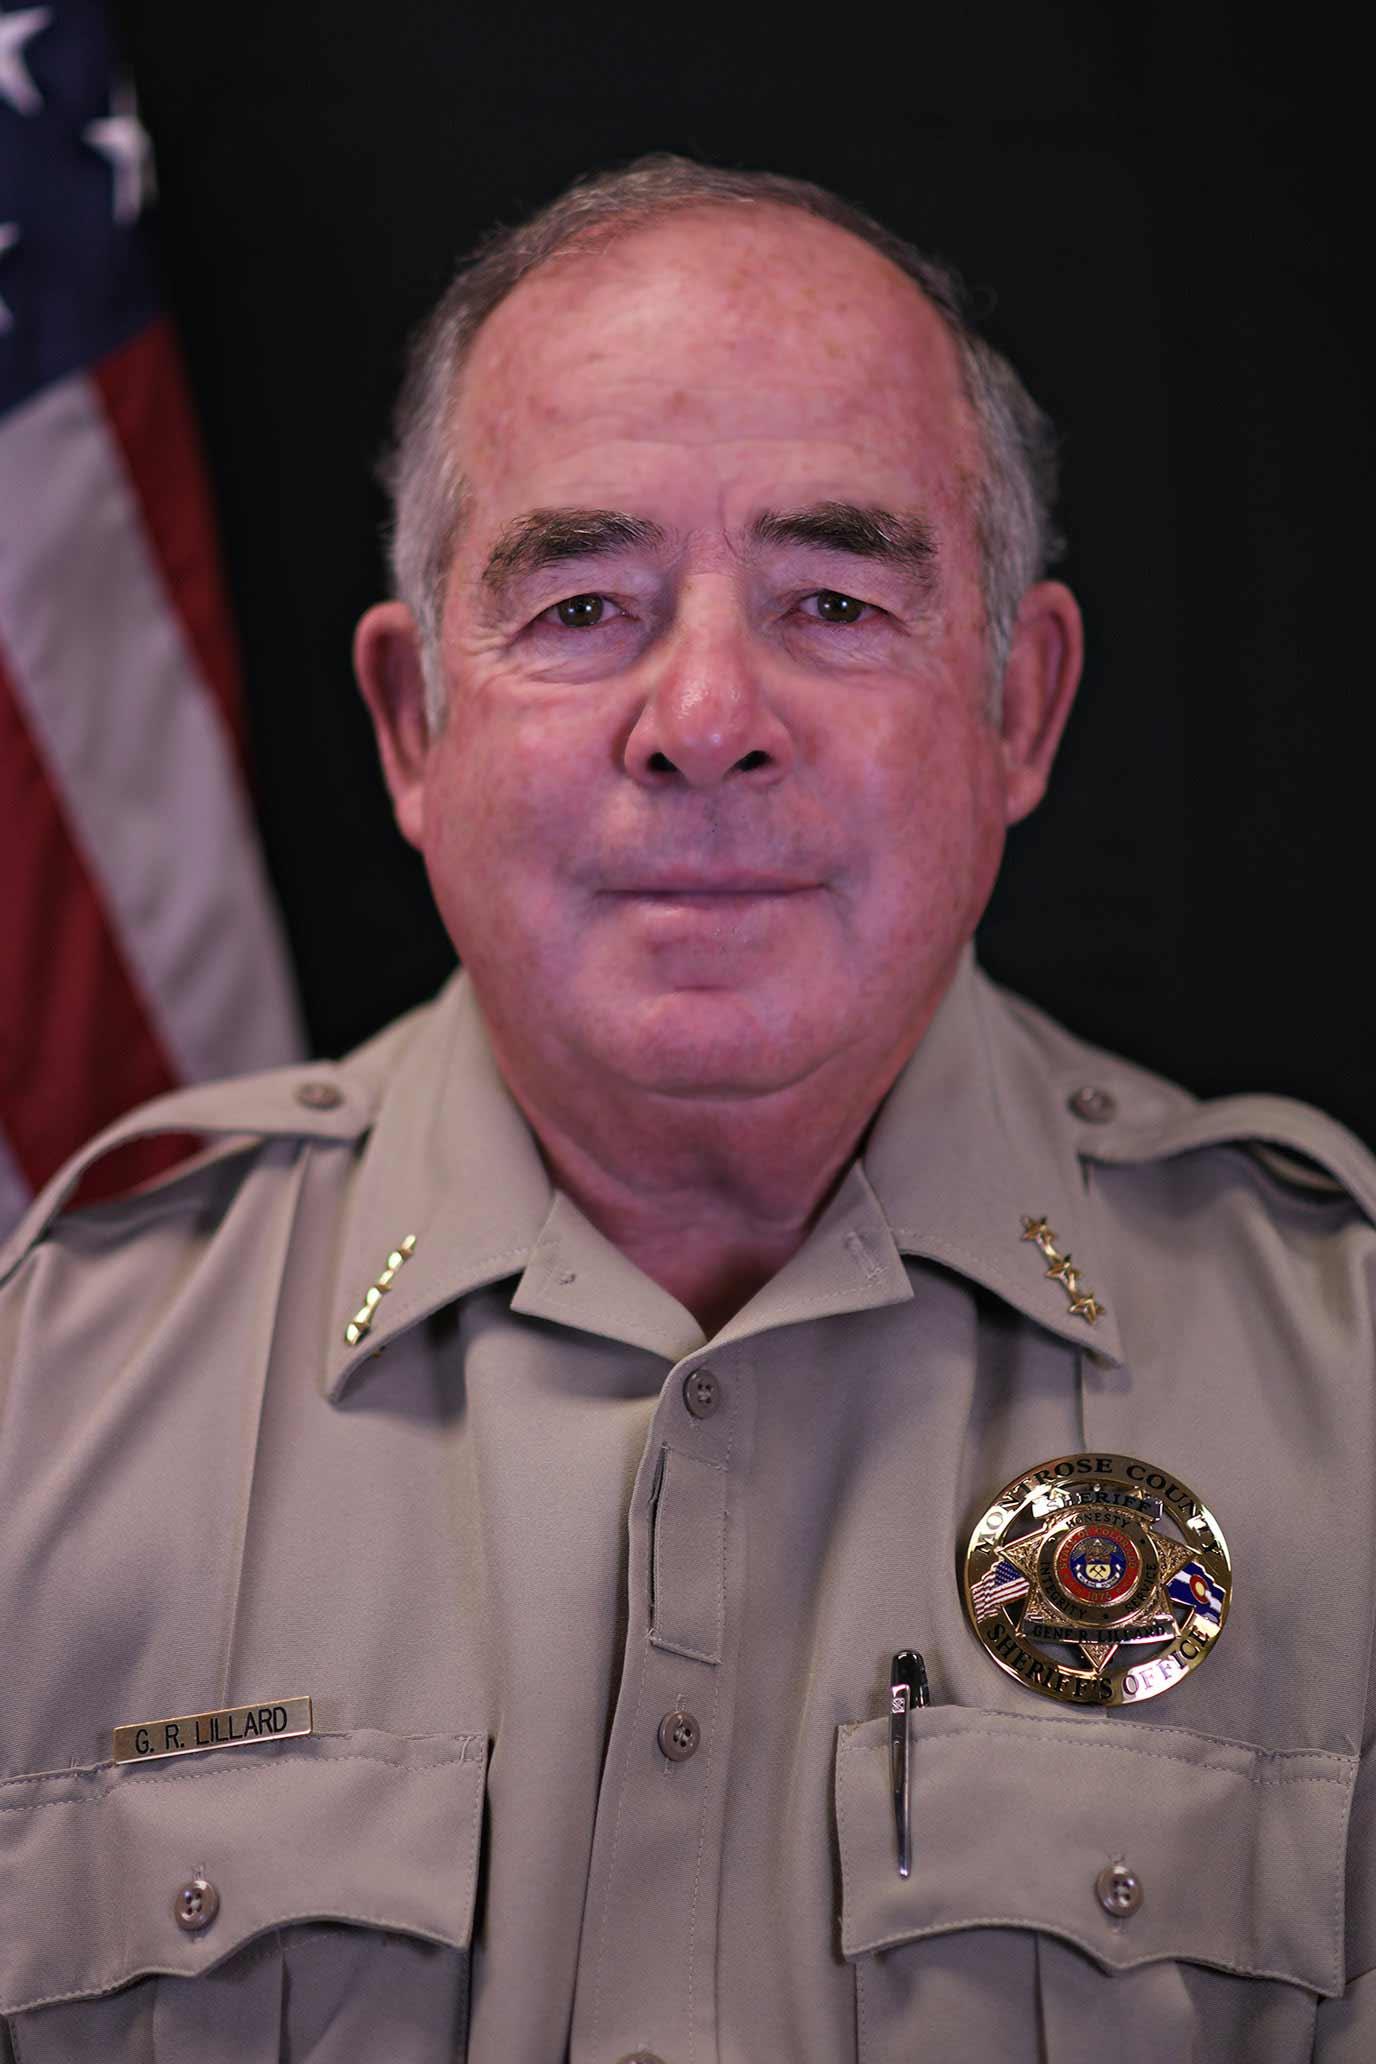 Sheriff Gene Lillard